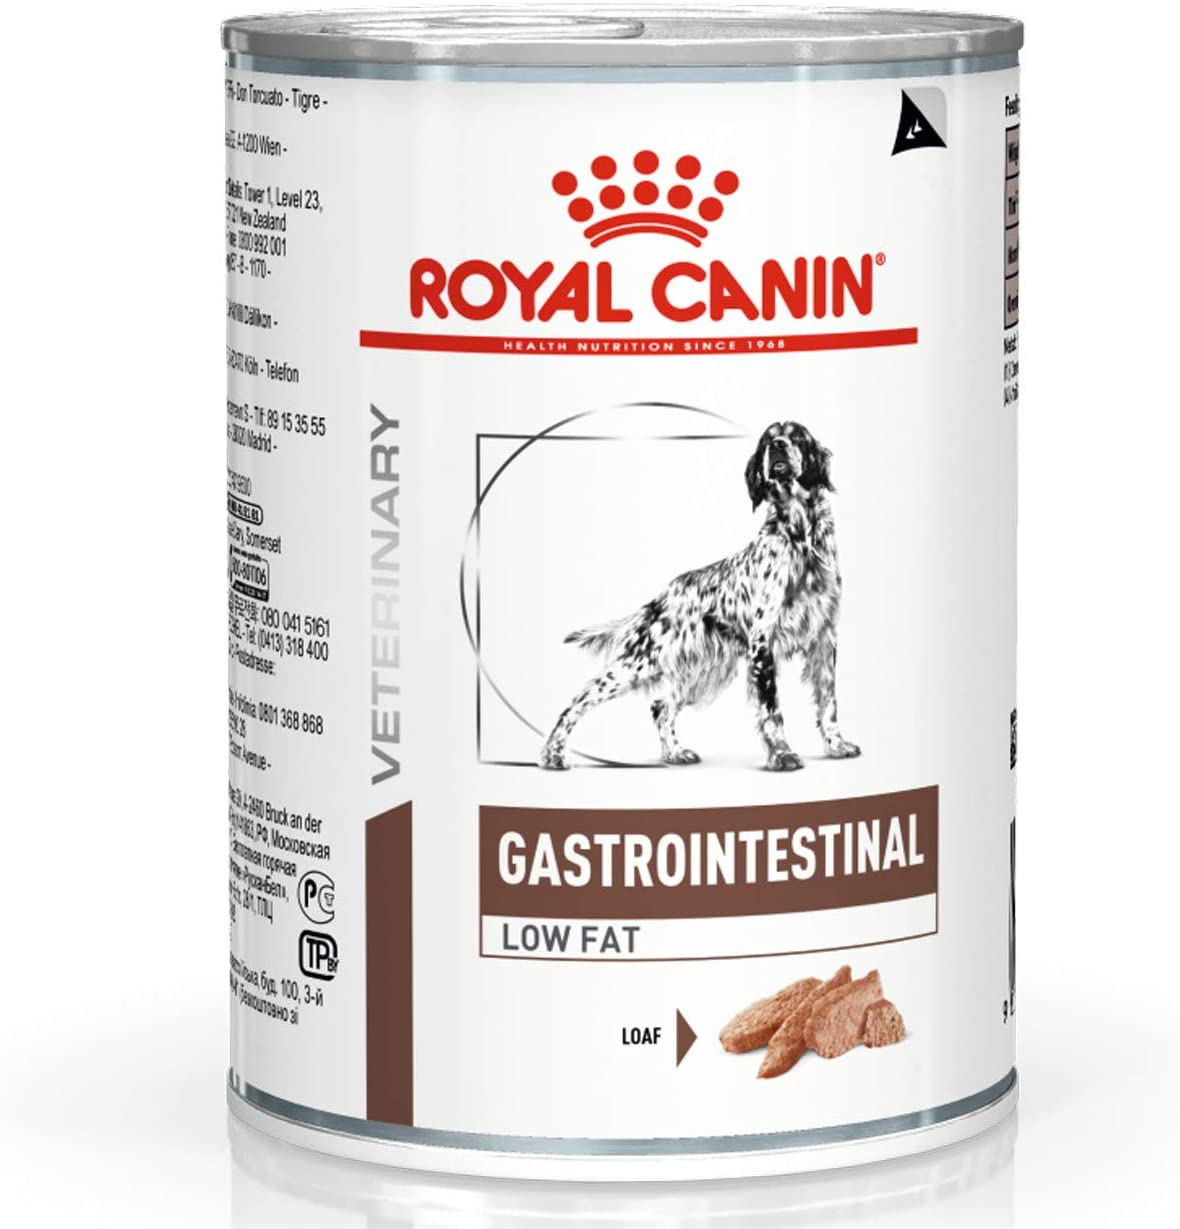 Royal Canin Canine Gastrointestinal Comida para perros baja en grasa 12 x 410g